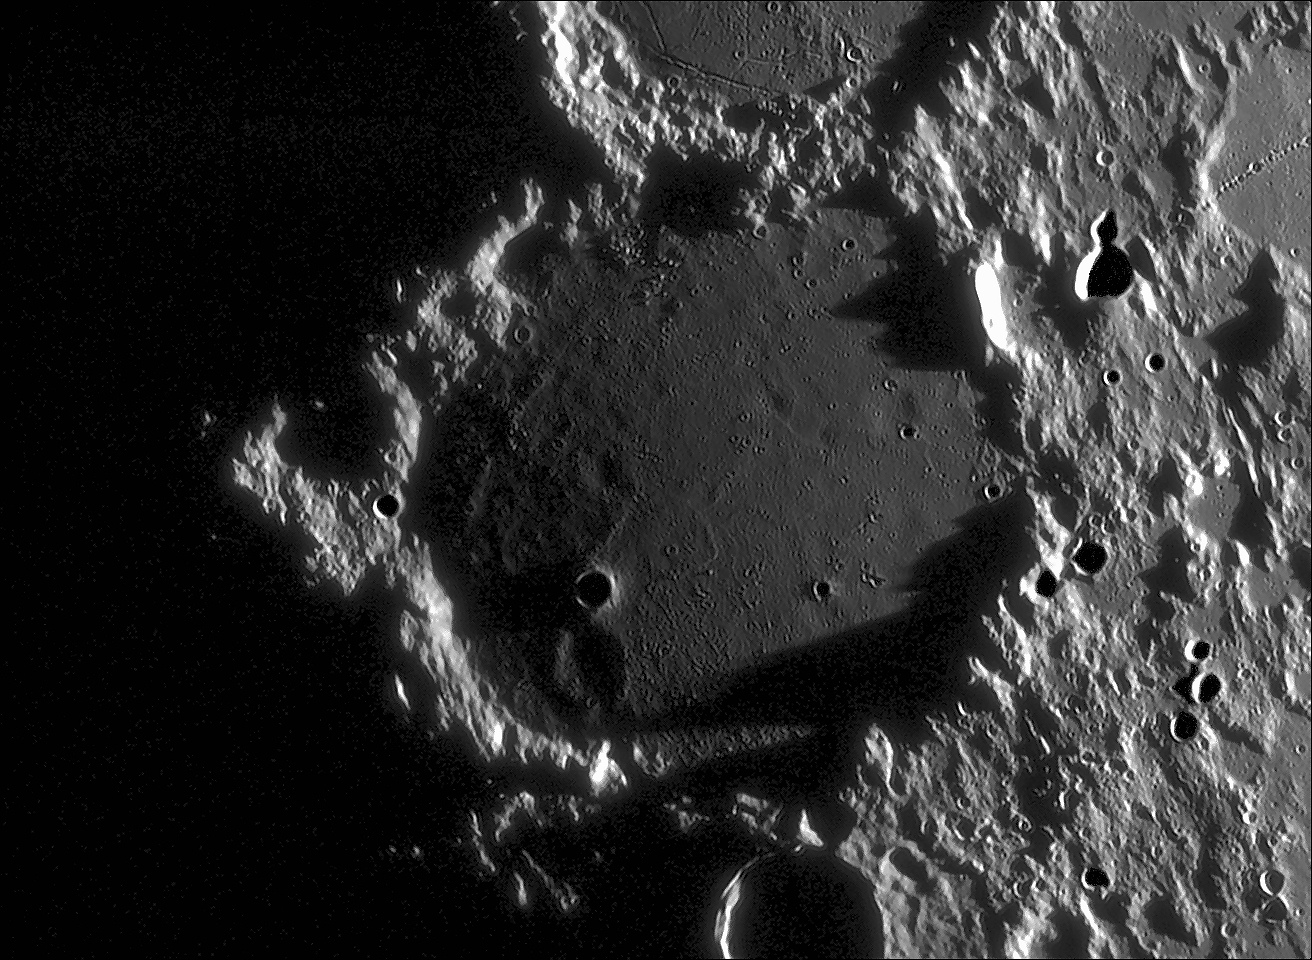 Ptolémée éclairage rasant du 01.09.10 C14 JpegV 2.jpg